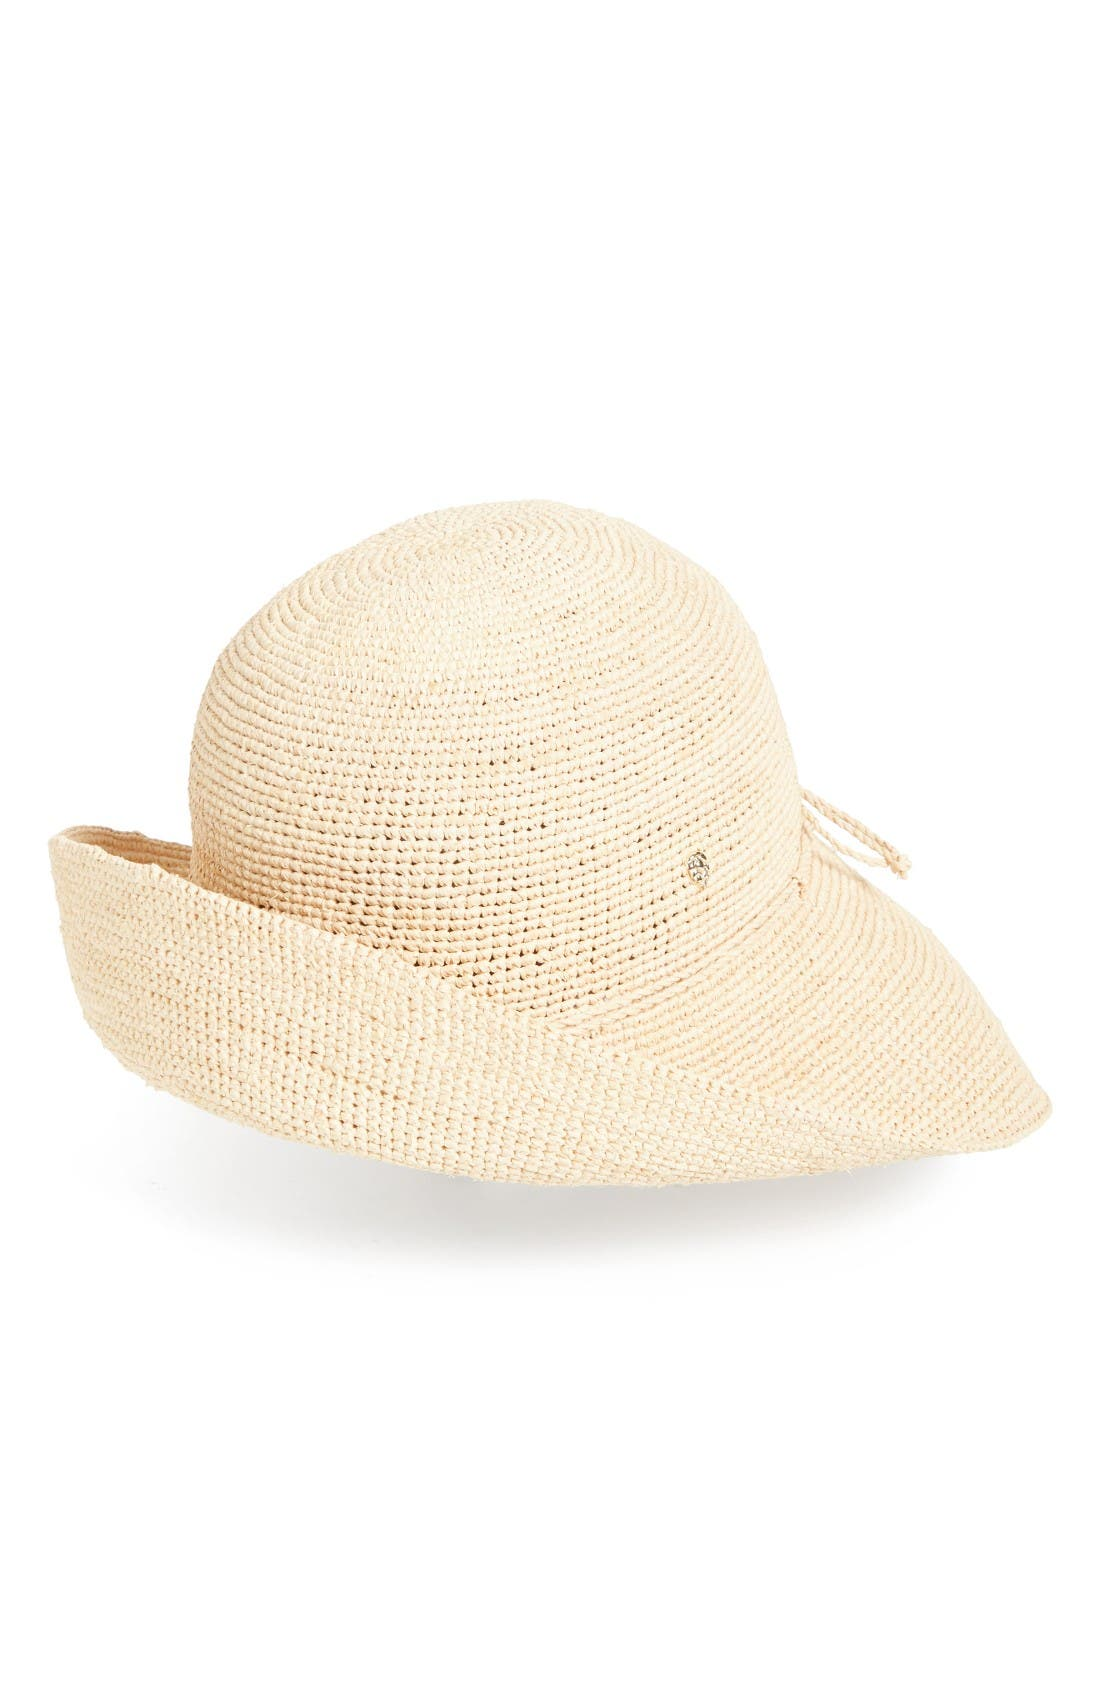 Main Image - Helen Kaminski 'Provence 10' Packable Raffia Hat